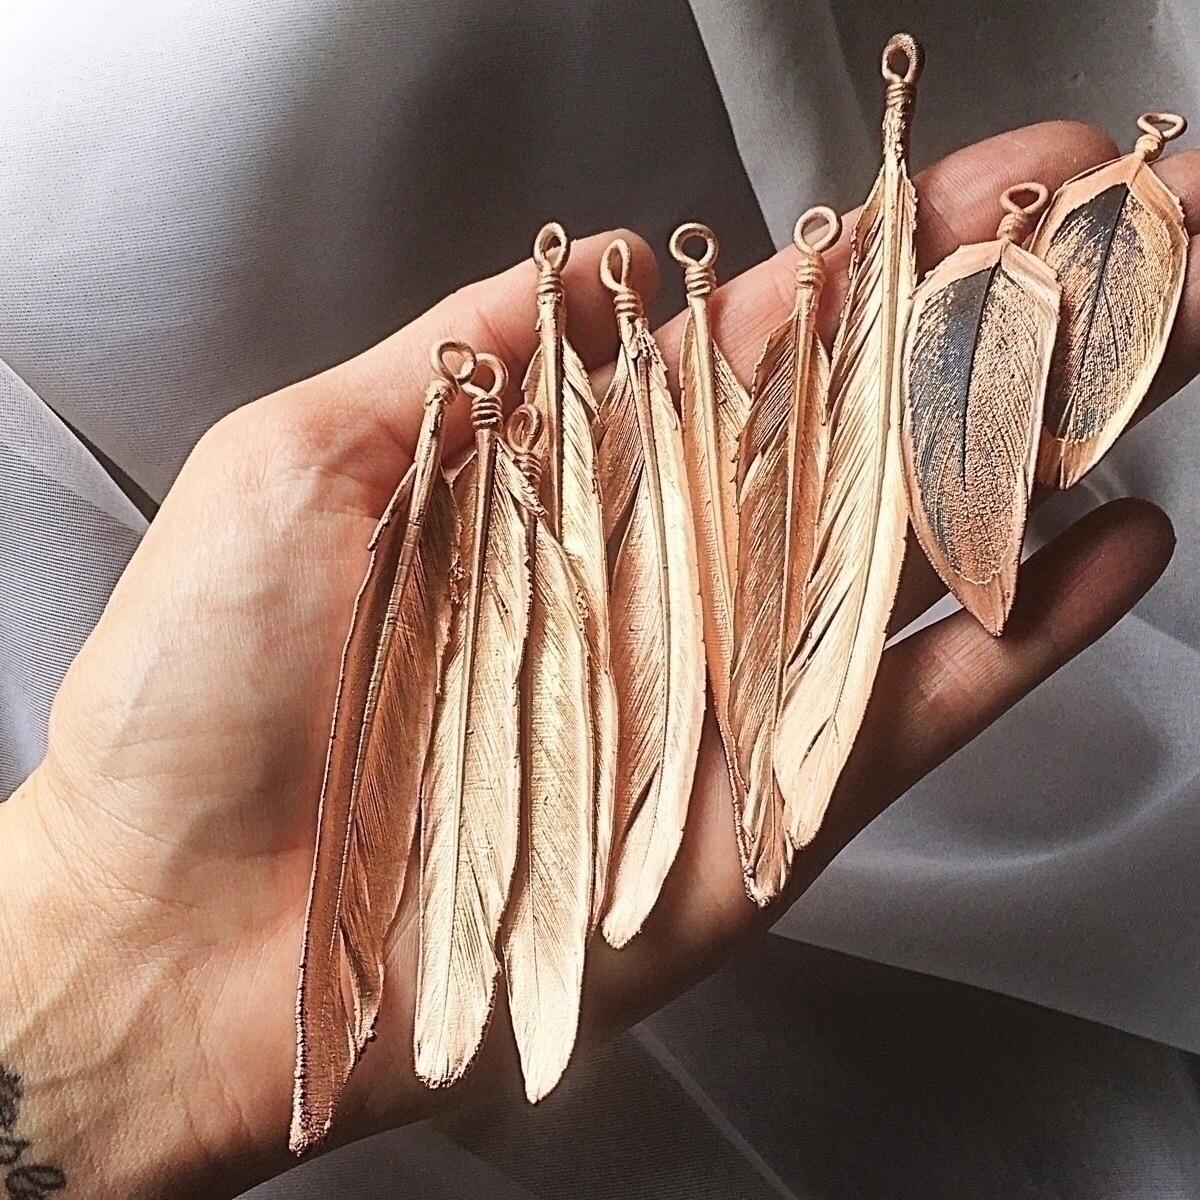 Electroformed feathers fresh ba - amykaeatelier   ello